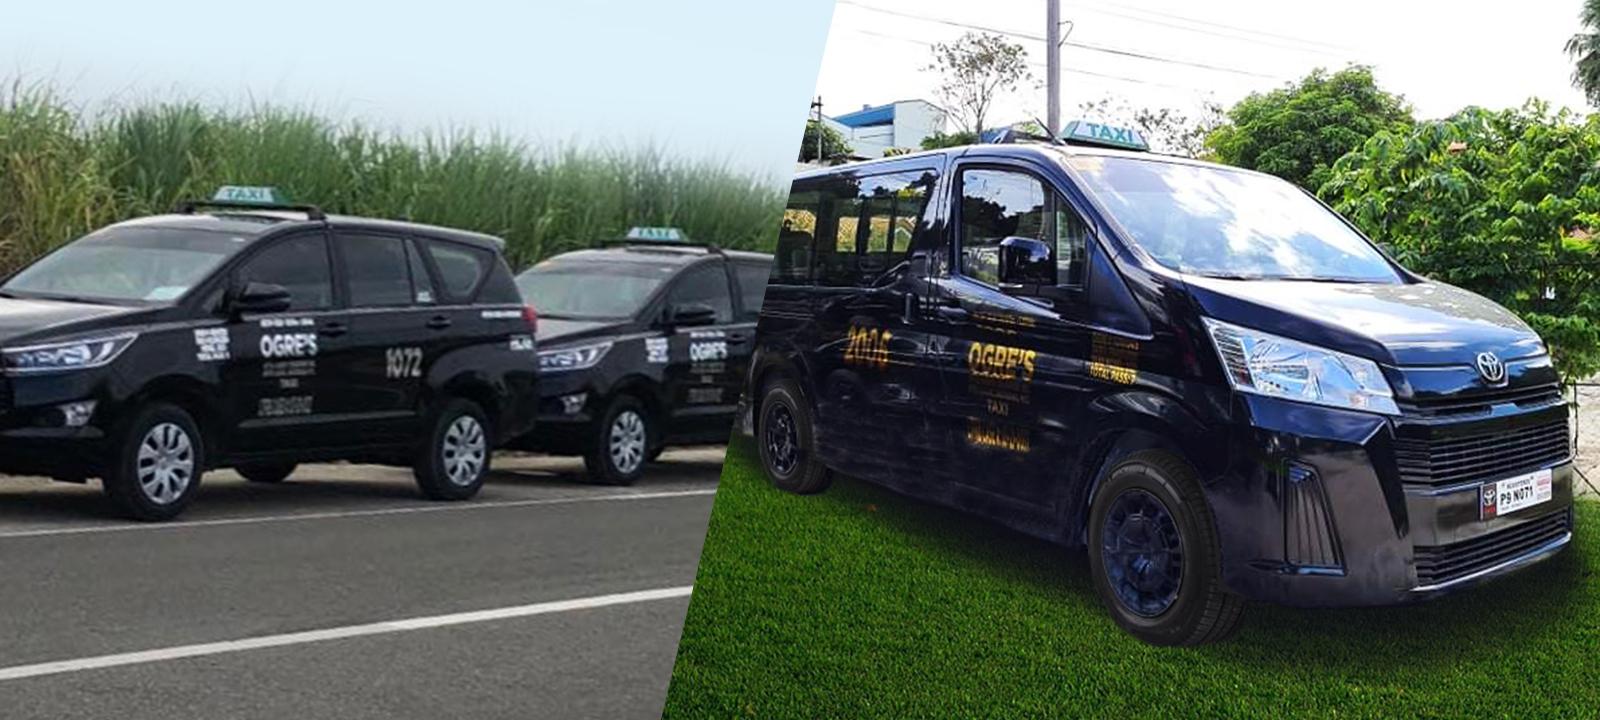 Modernizing taxis in Cebu